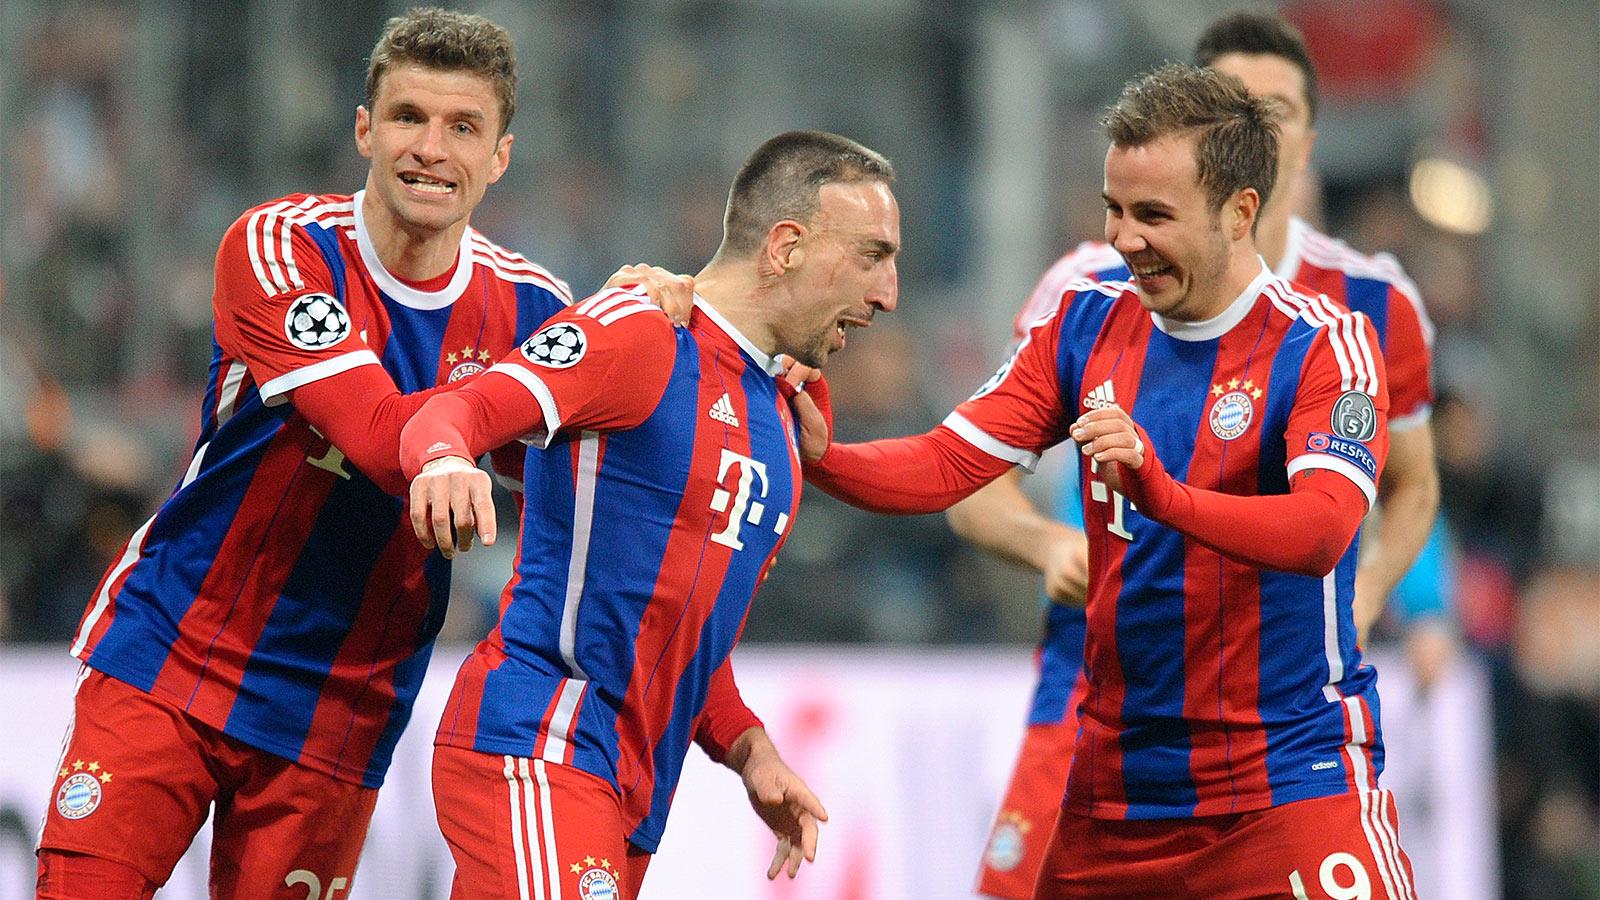 Franck Ribery and Mario Gotze deemed fit for Bayern Munich